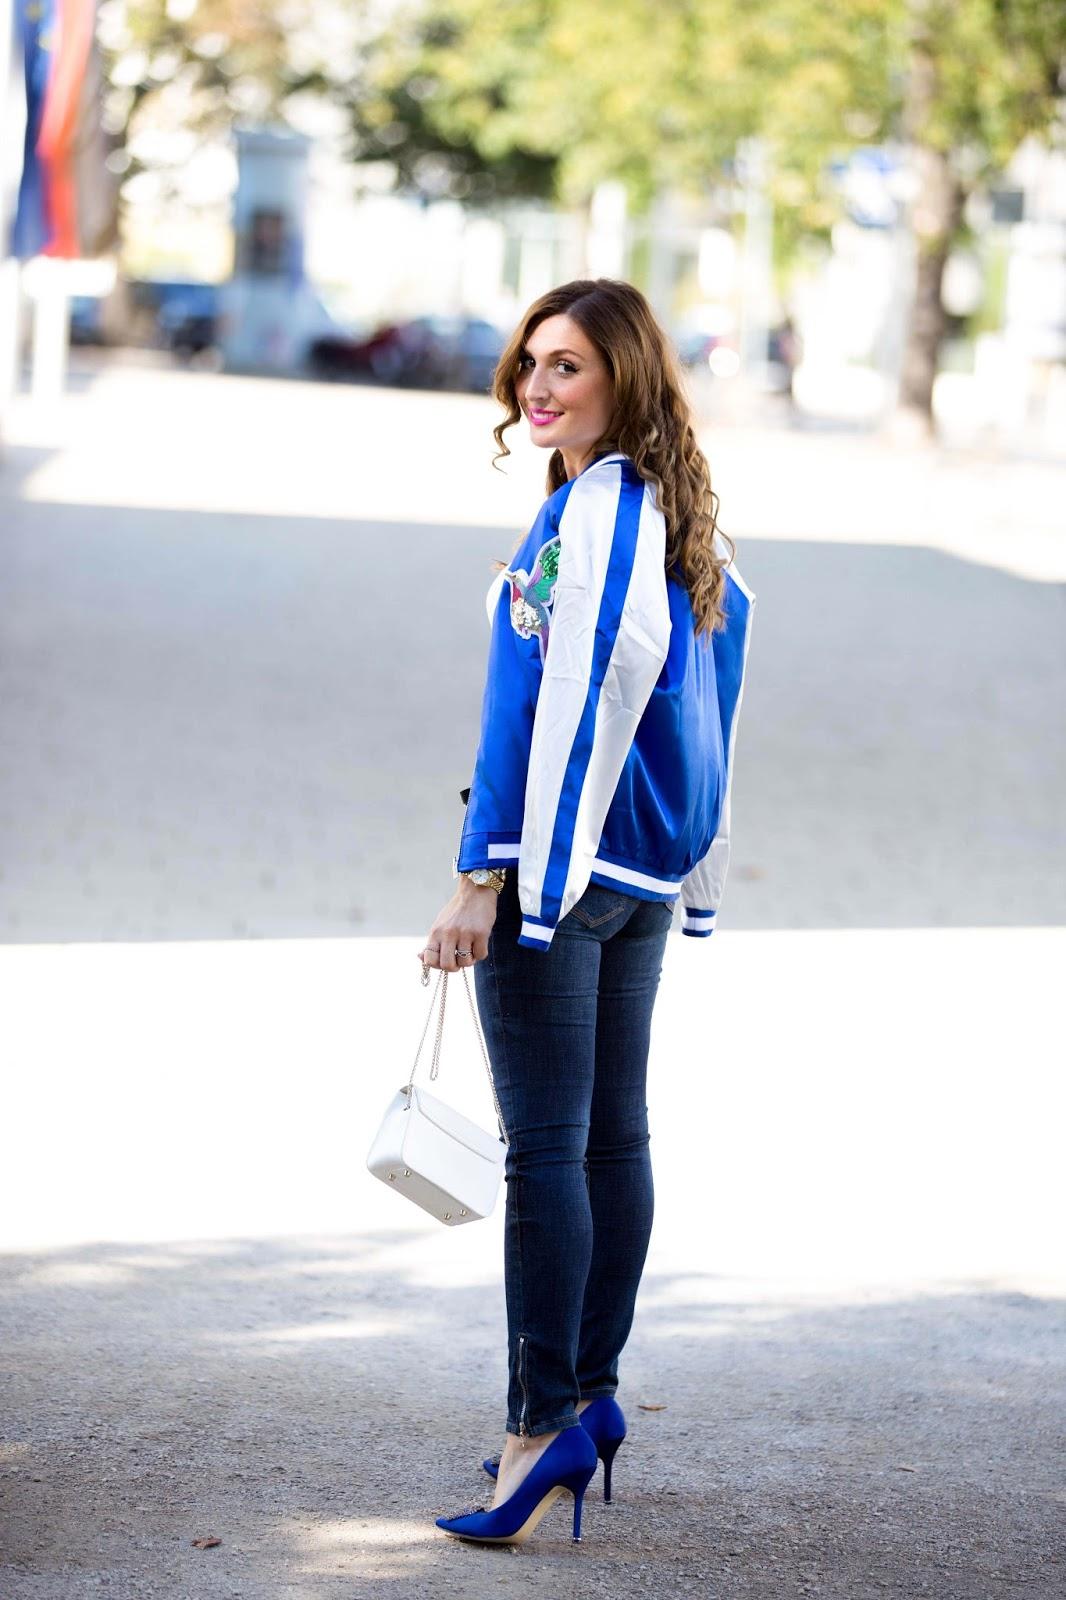 Manolo Blanik Shuhe - Blaue Manolo Blanik Schuhe kombinieren Bomber Jacke - Blaue Jacke - Blaue Sheinside Jacke wie Olivia Palermo - Olivia Palermo Stil - Fashionstylebyjohanna-Herbstlook Blogger-fashionblog-frankfurtmurtblogger-fashionblogger-